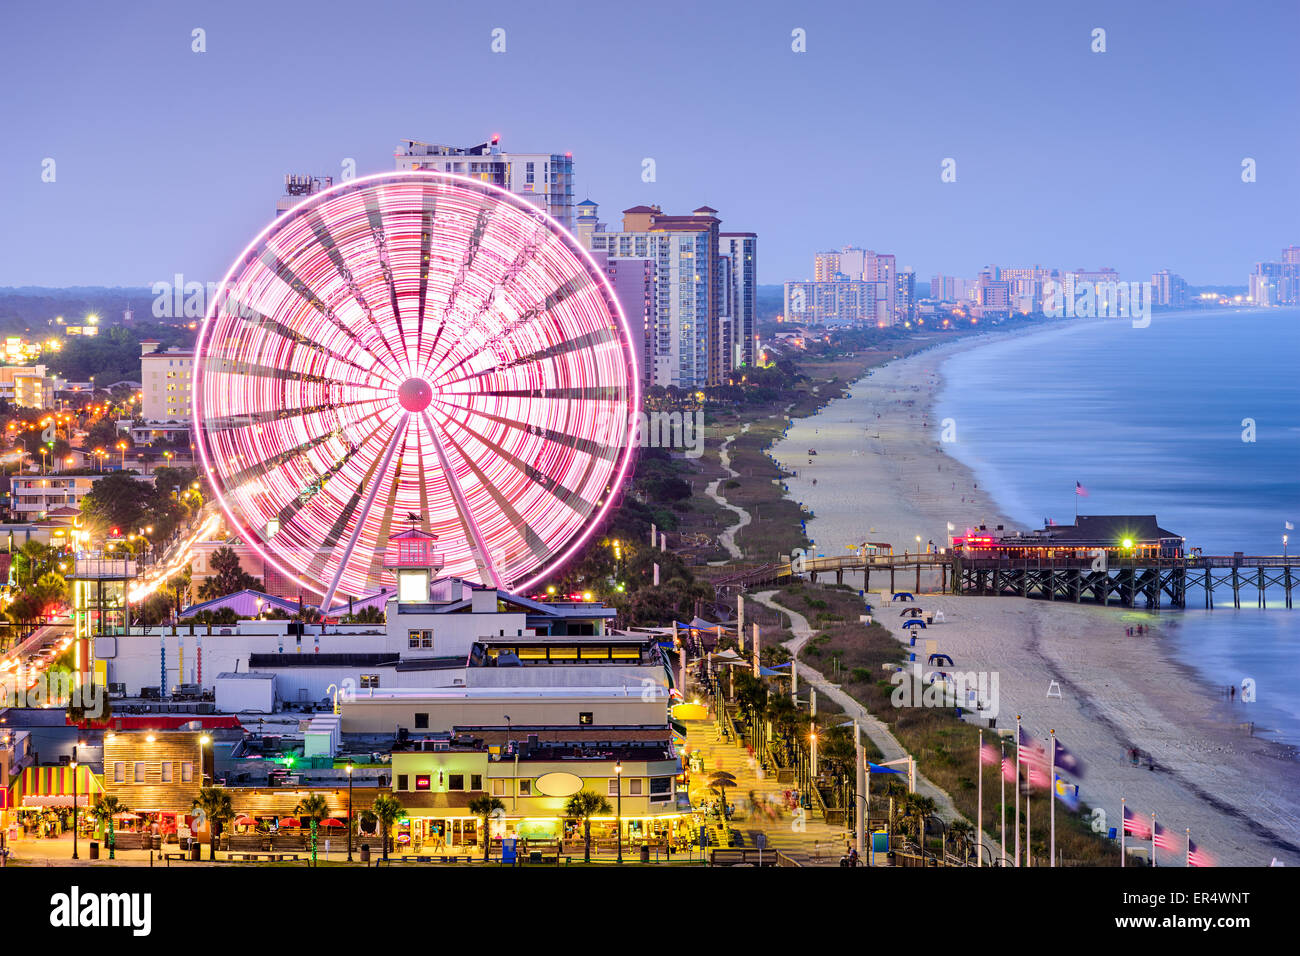 Skyline von Myrtle Beach, South Carolina, USA. Stockbild